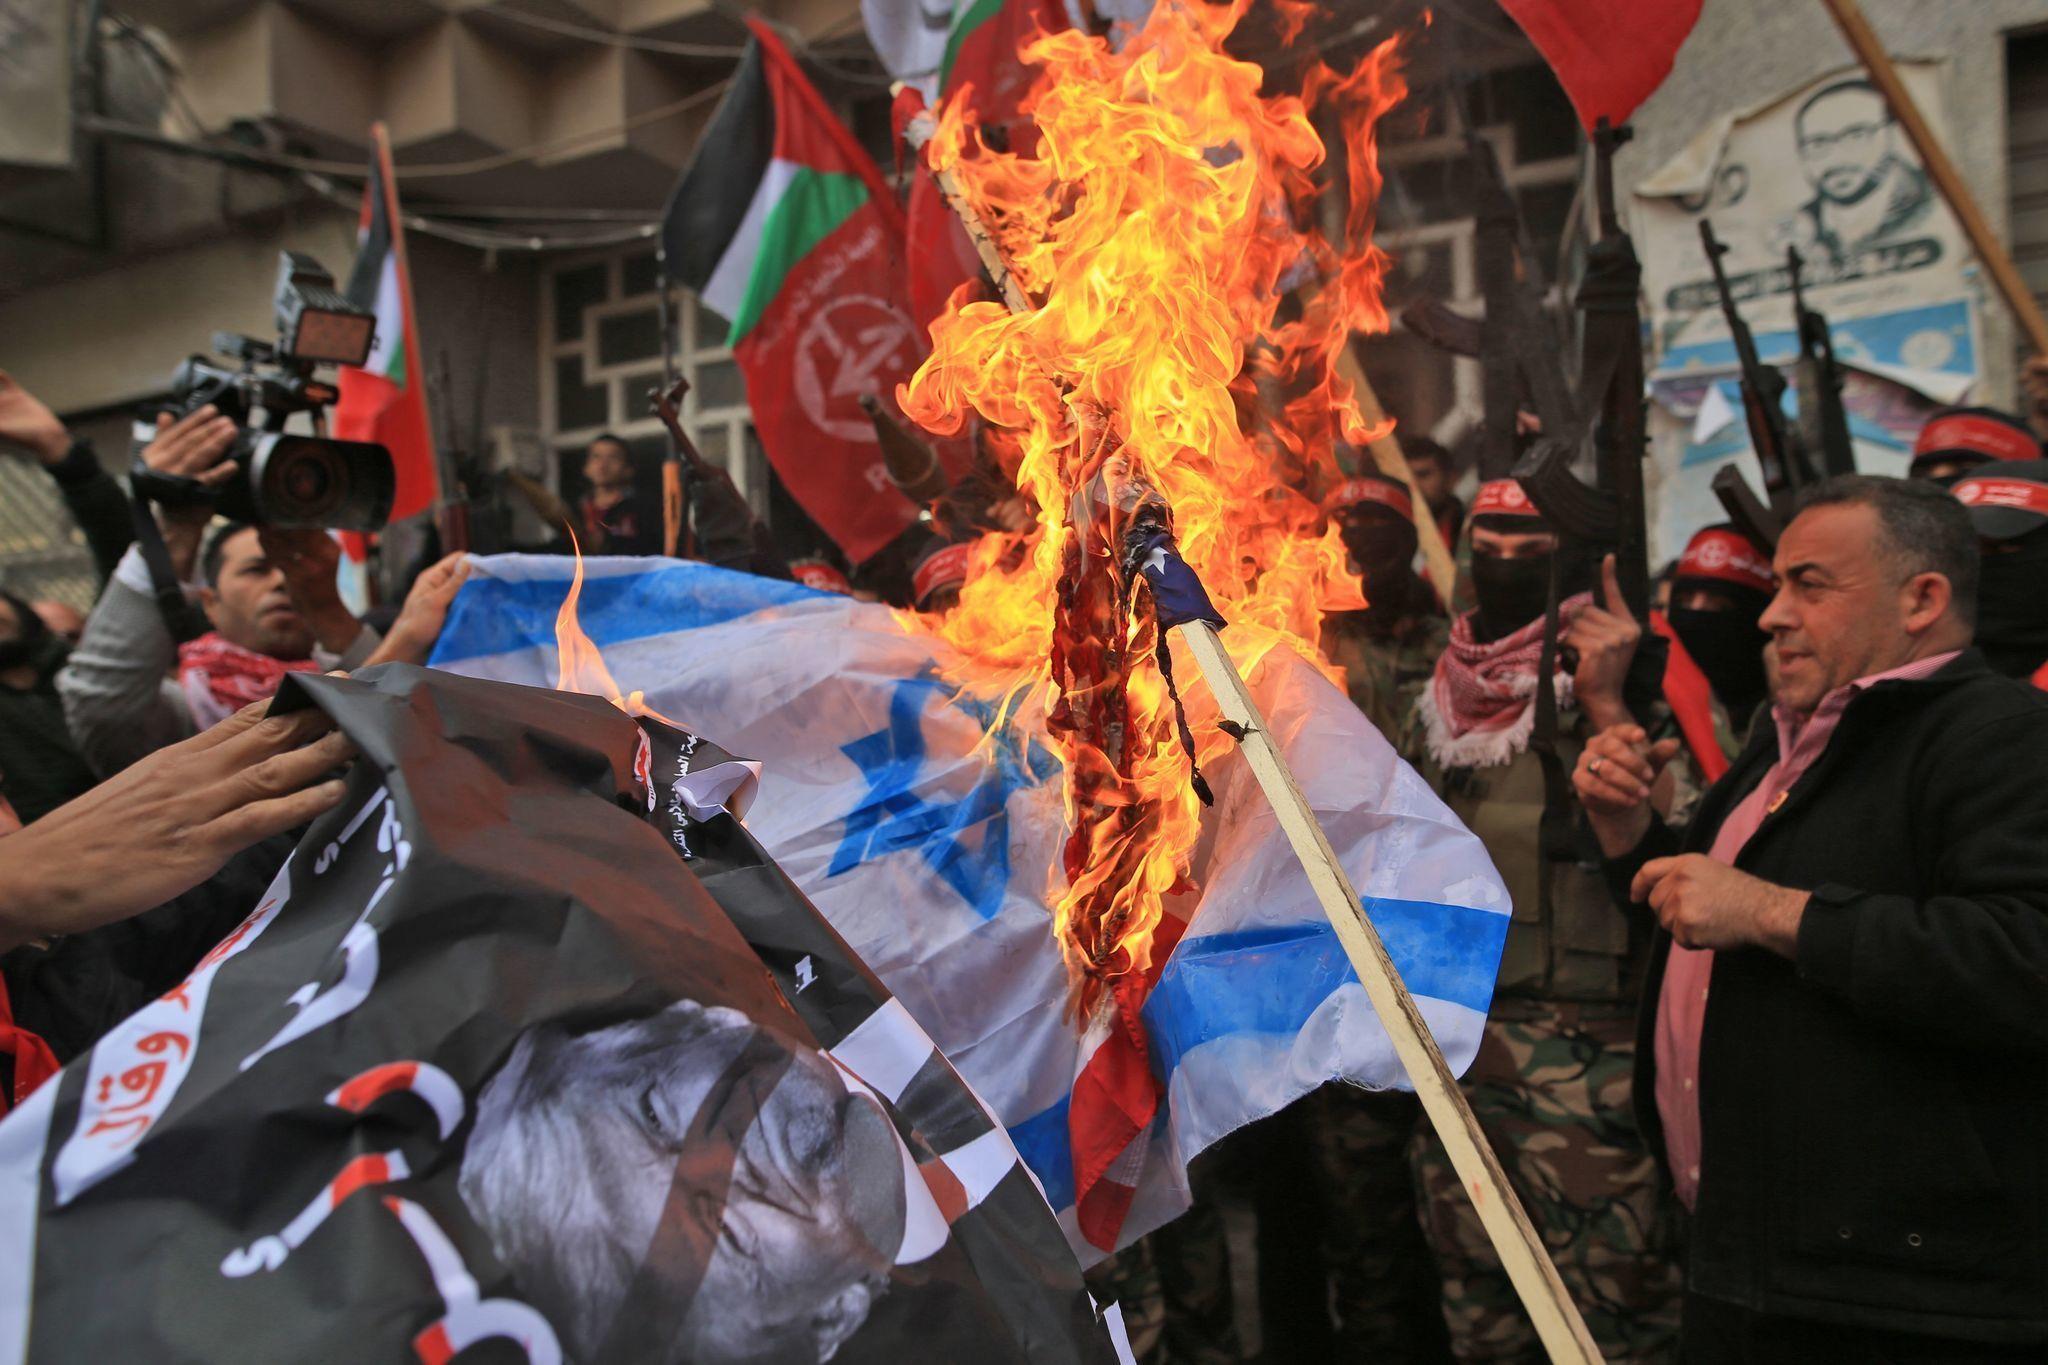 Protests across Middle East, embassies warn U.S. citizens following Trump's Jerusalem declaration